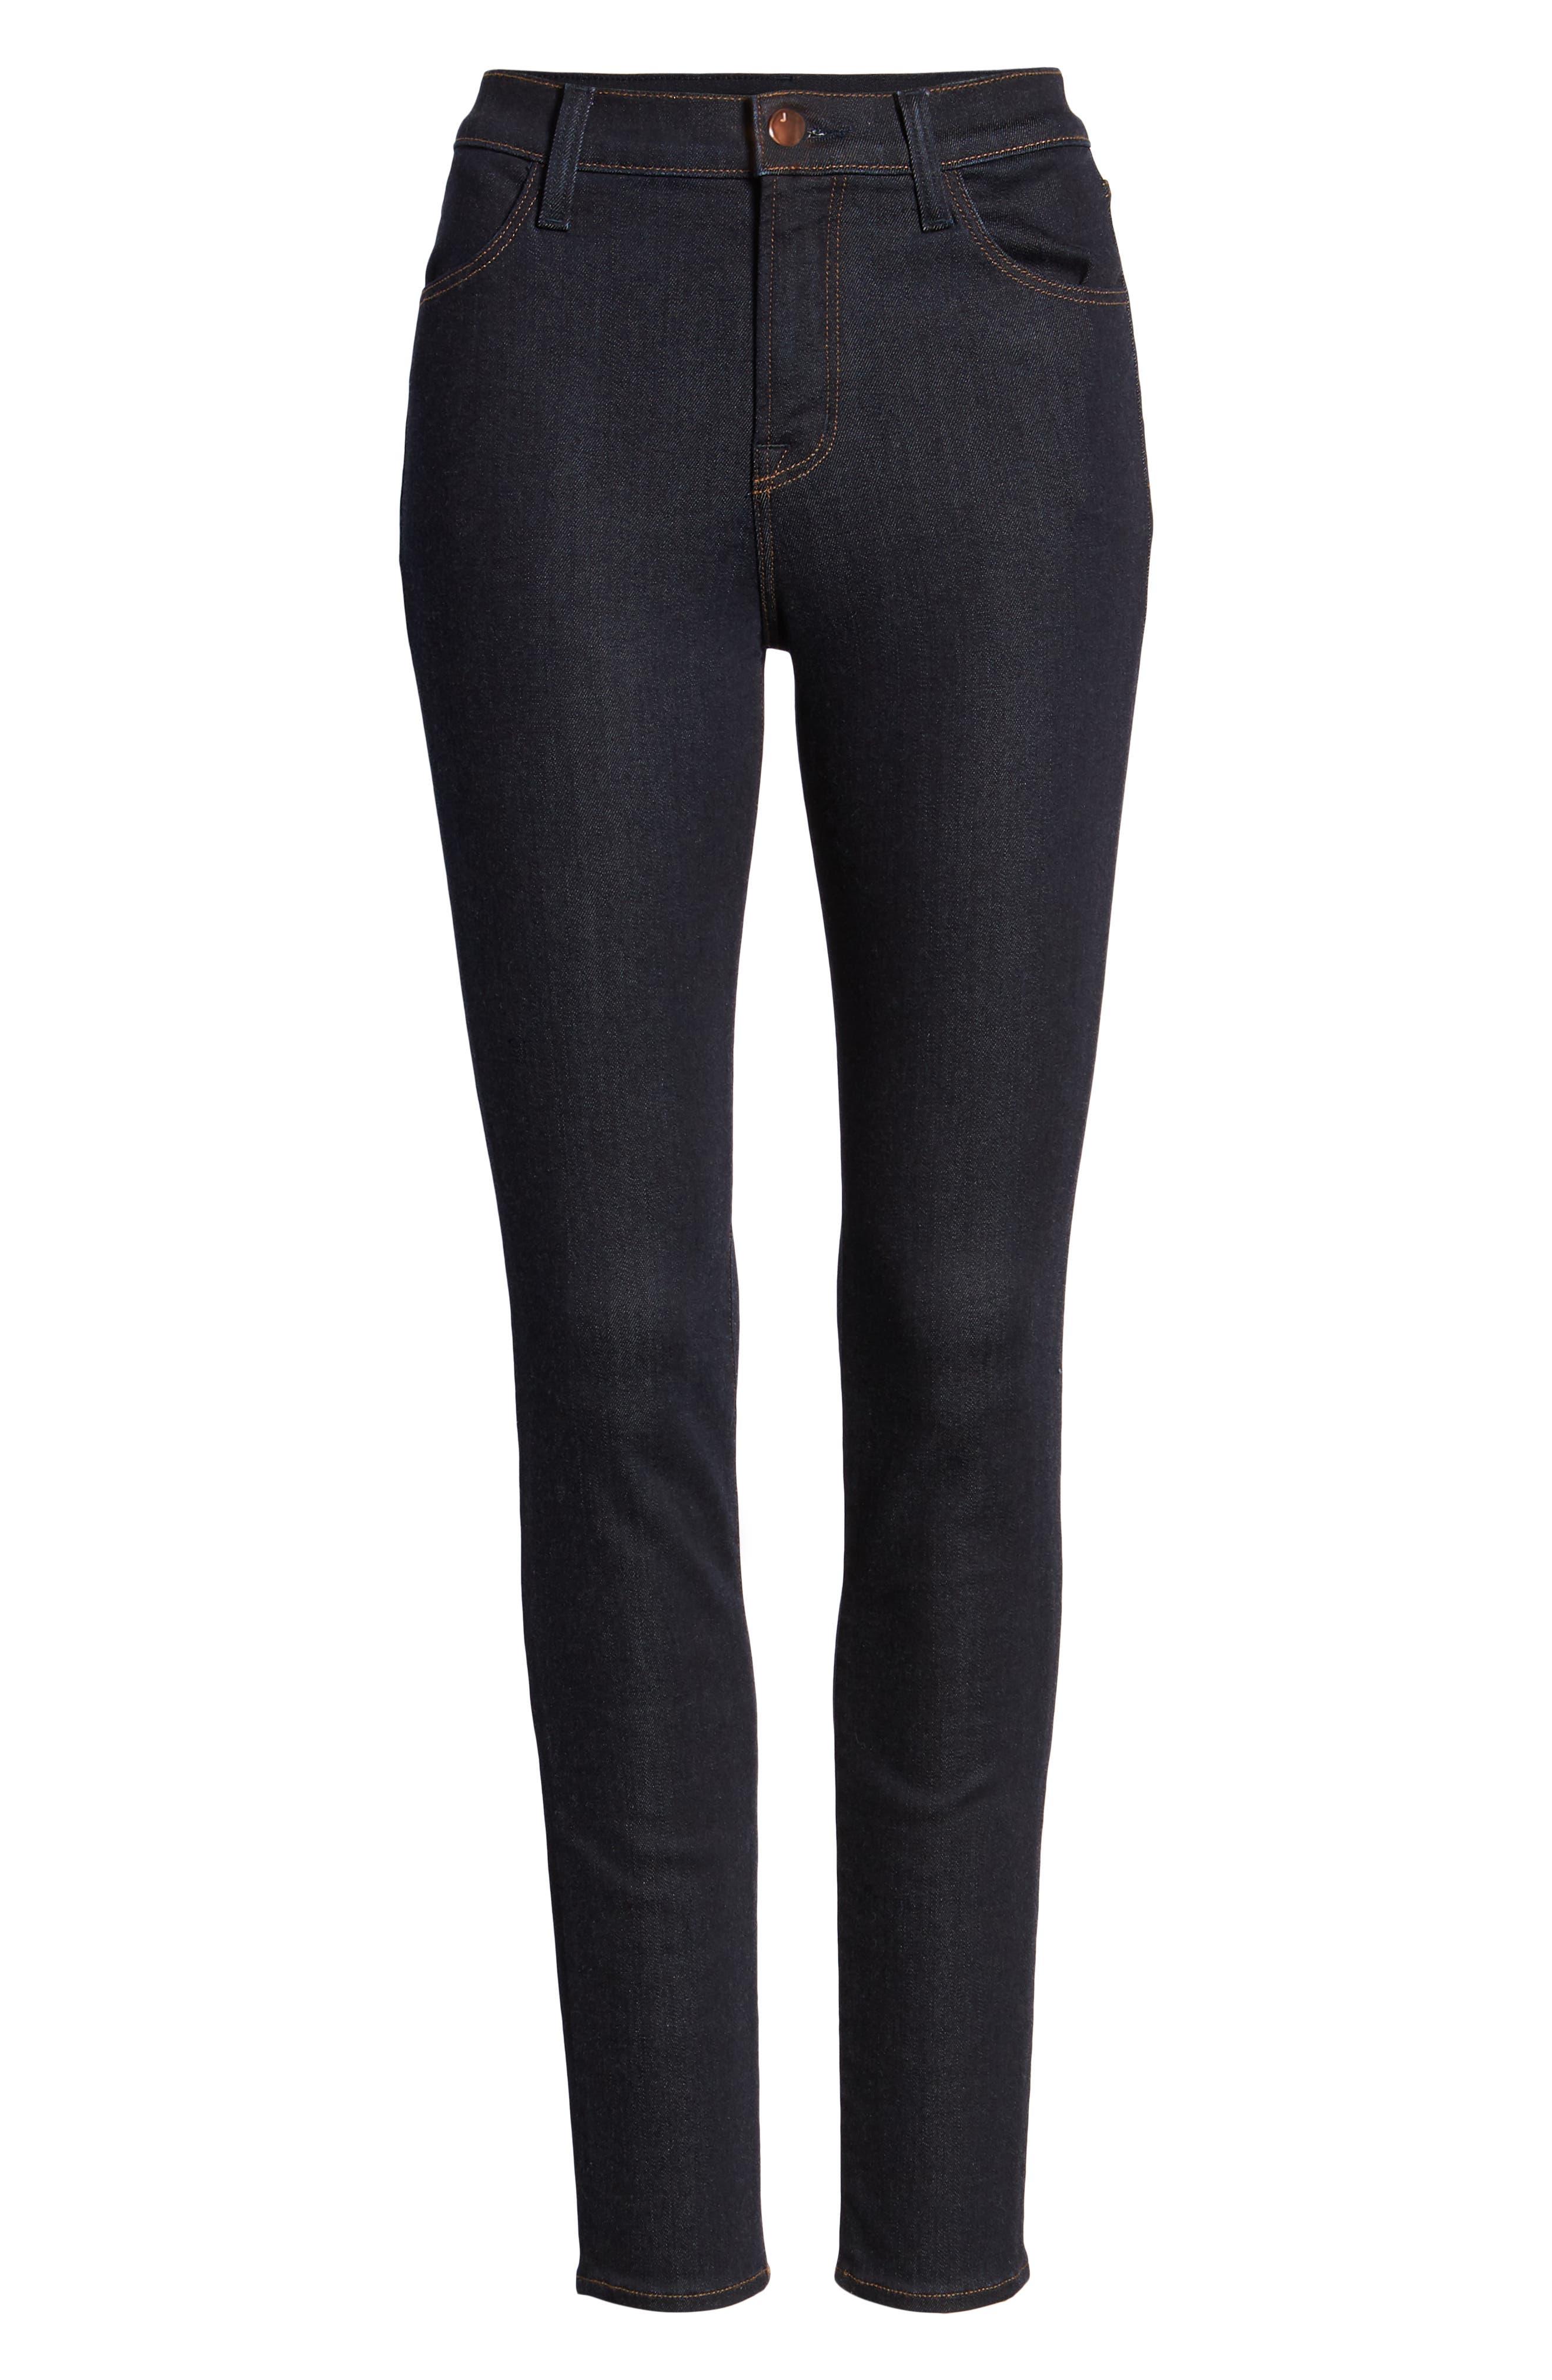 Maria High Waist Super Skinny Jeans,                             Alternate thumbnail 7, color,                             DARK TWILIGHT